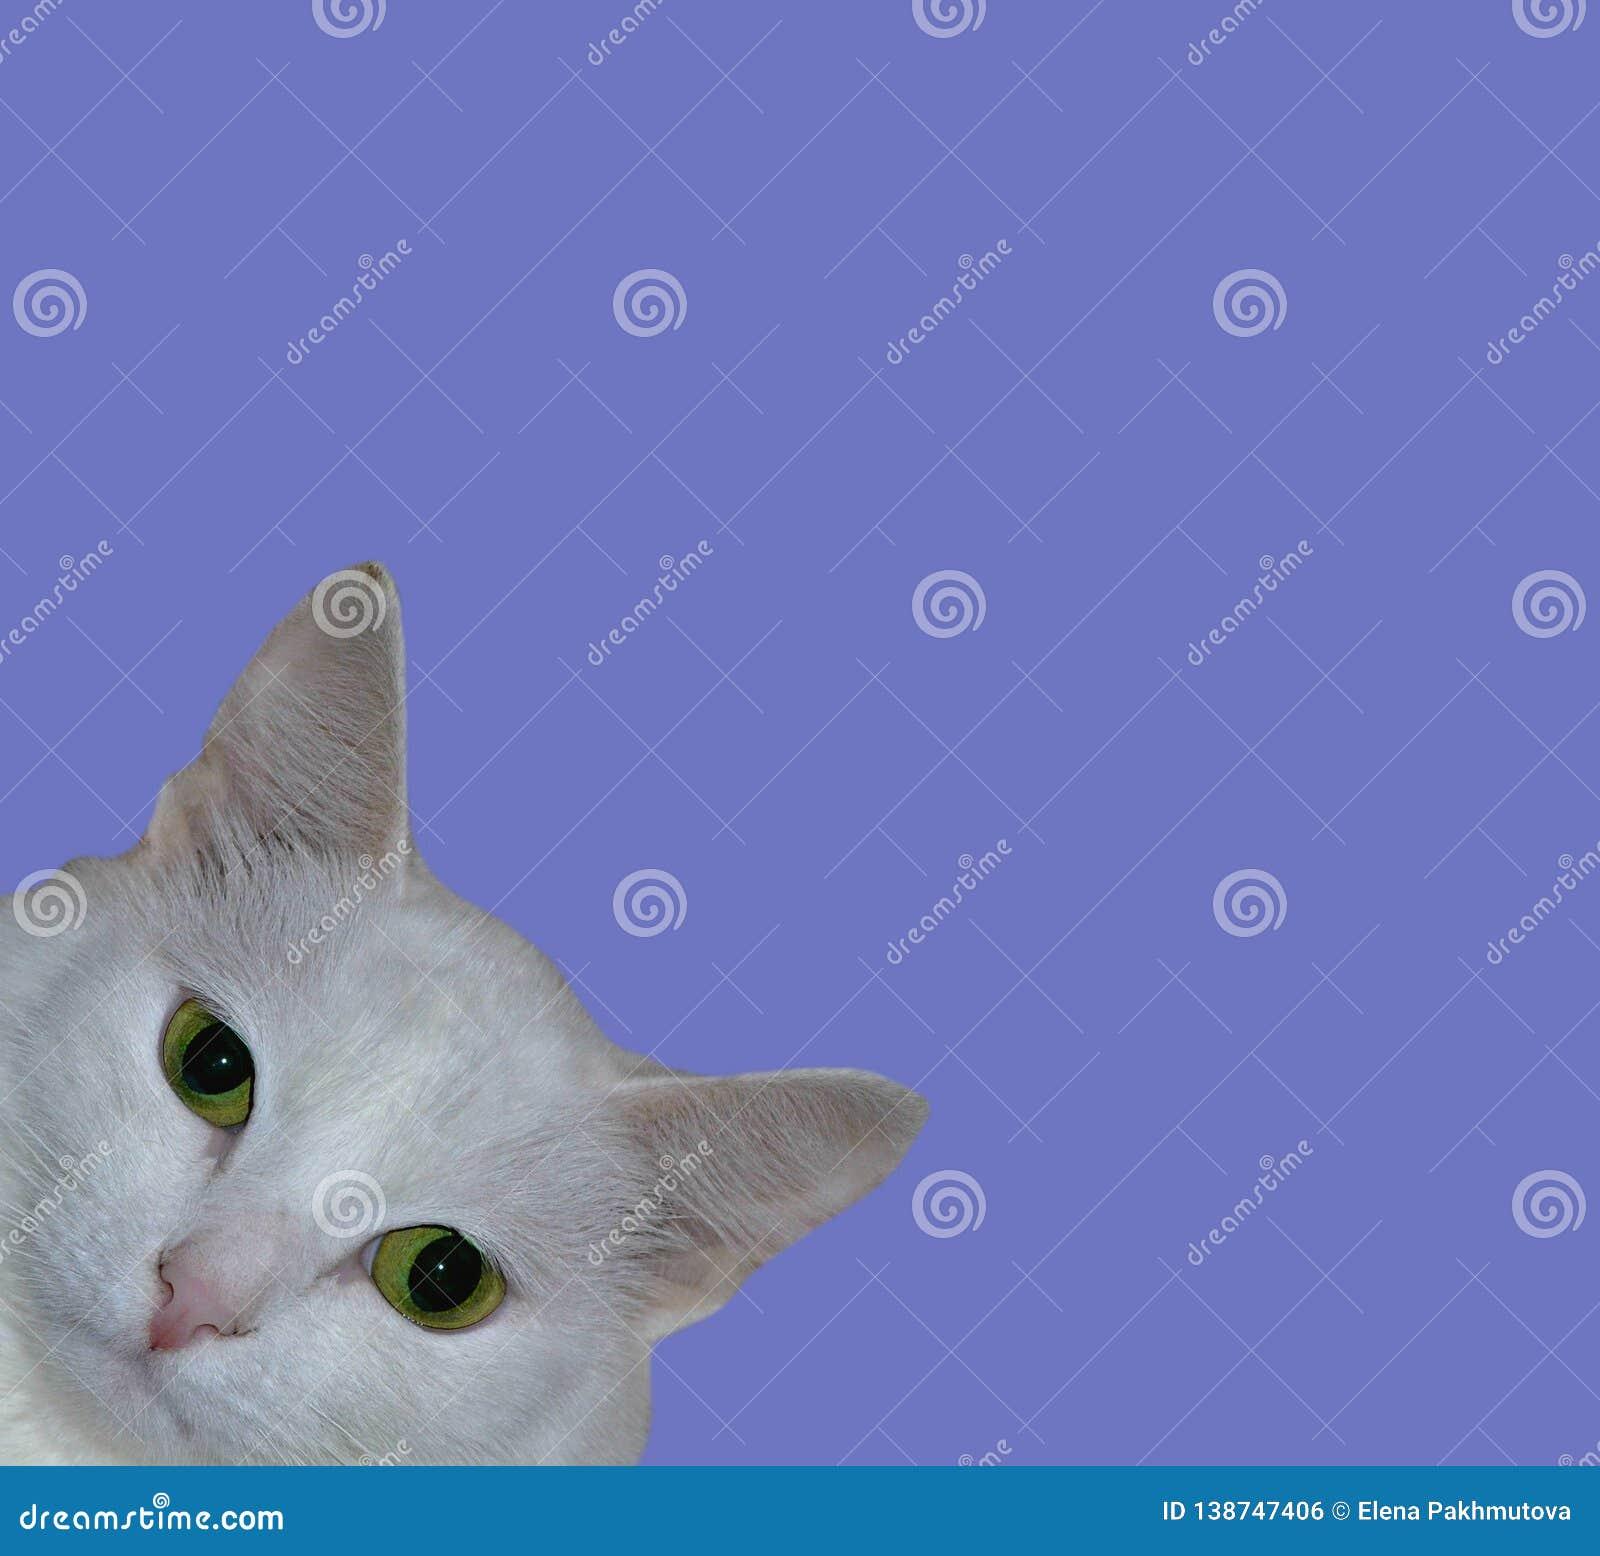 Cat, animal, kitten, white, pet, feline, cute, domestic, portrait, fur, eyes, pets, animals, kitty, looking, beautiful, young, ado